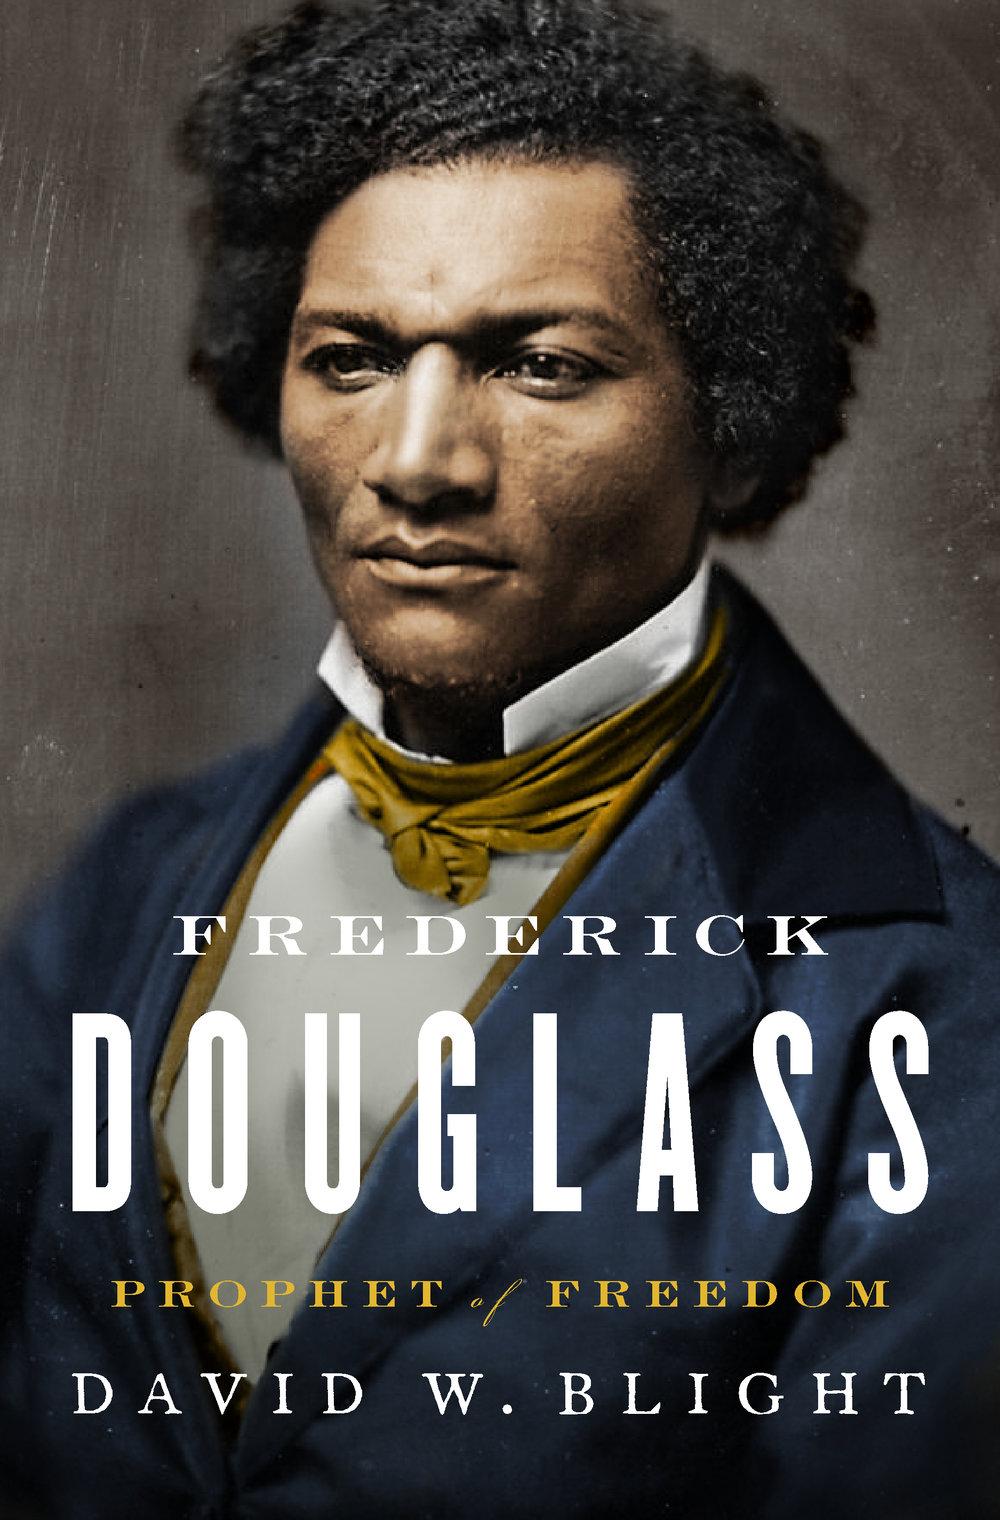 Frederick Douglass-BOOK COVER.jpg